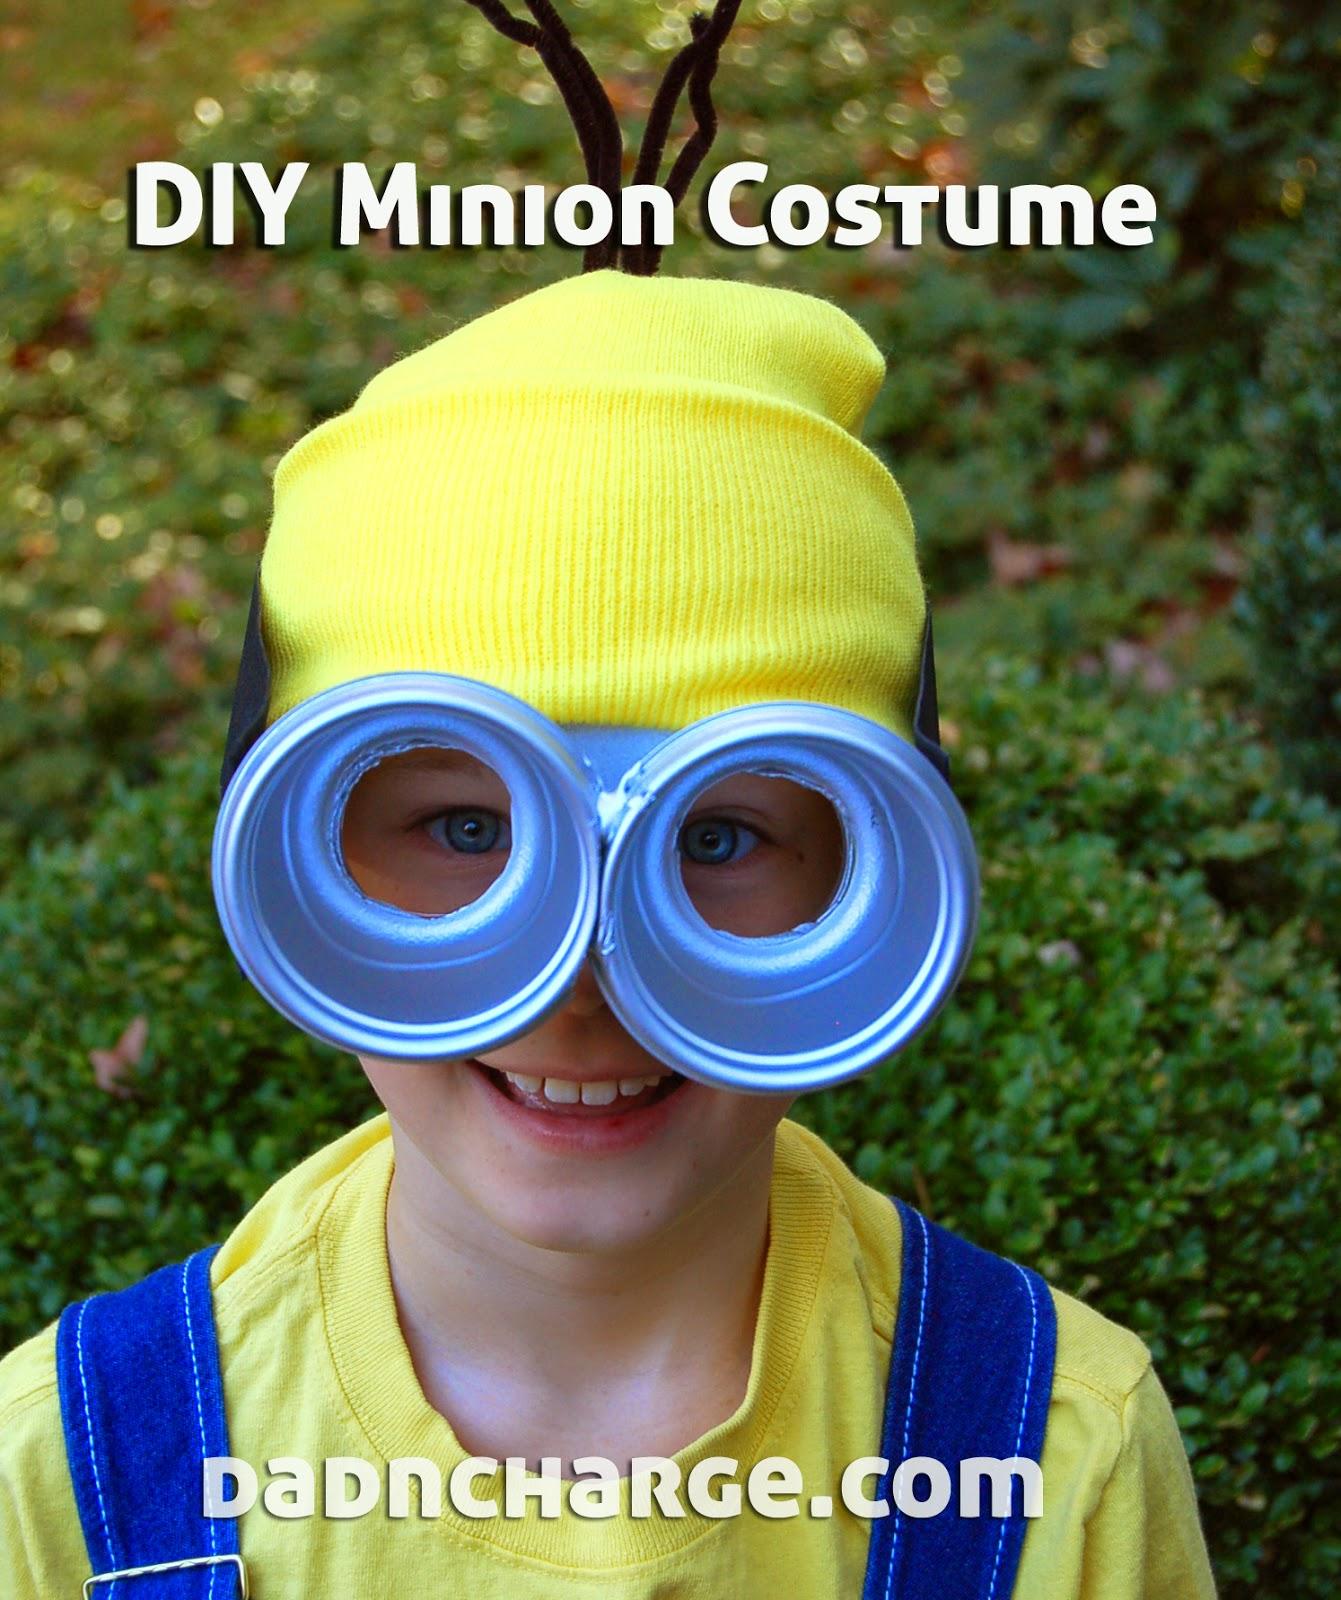 DIY Minion Costume & DadNCharge: DIY Minion Costume